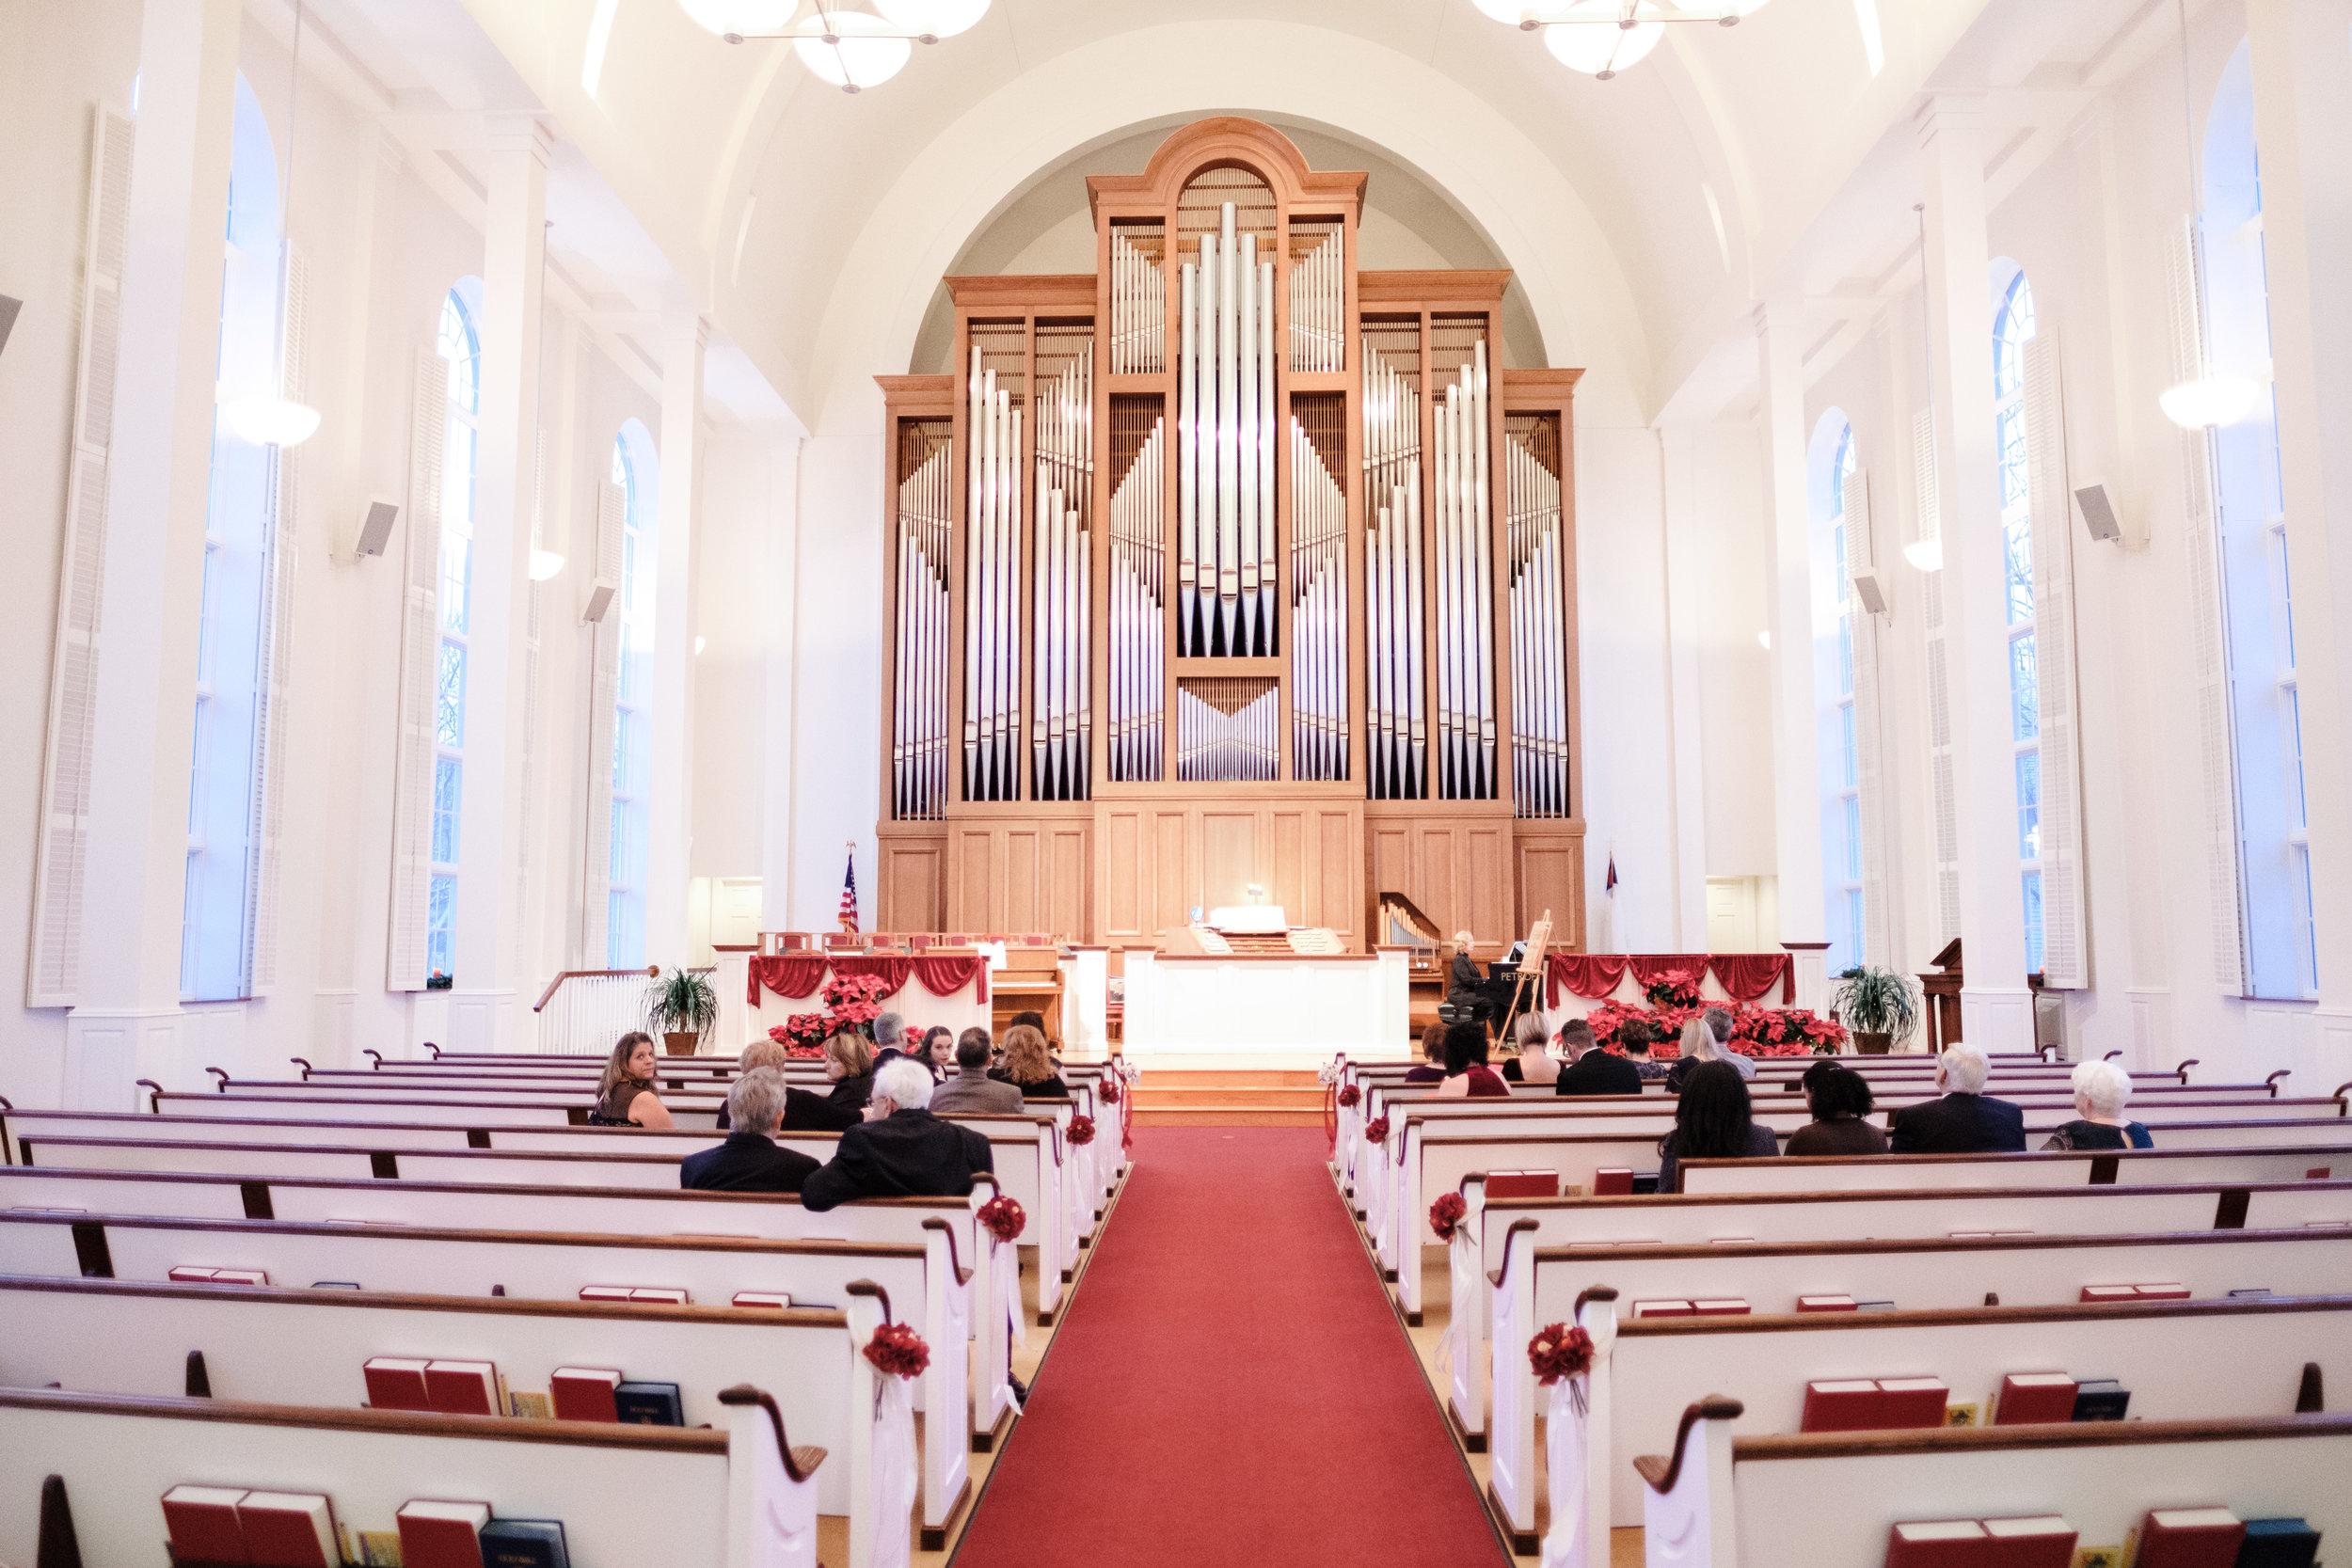 18-12-28 Corinne-Henry-Pavilion-Wedding-238.jpg